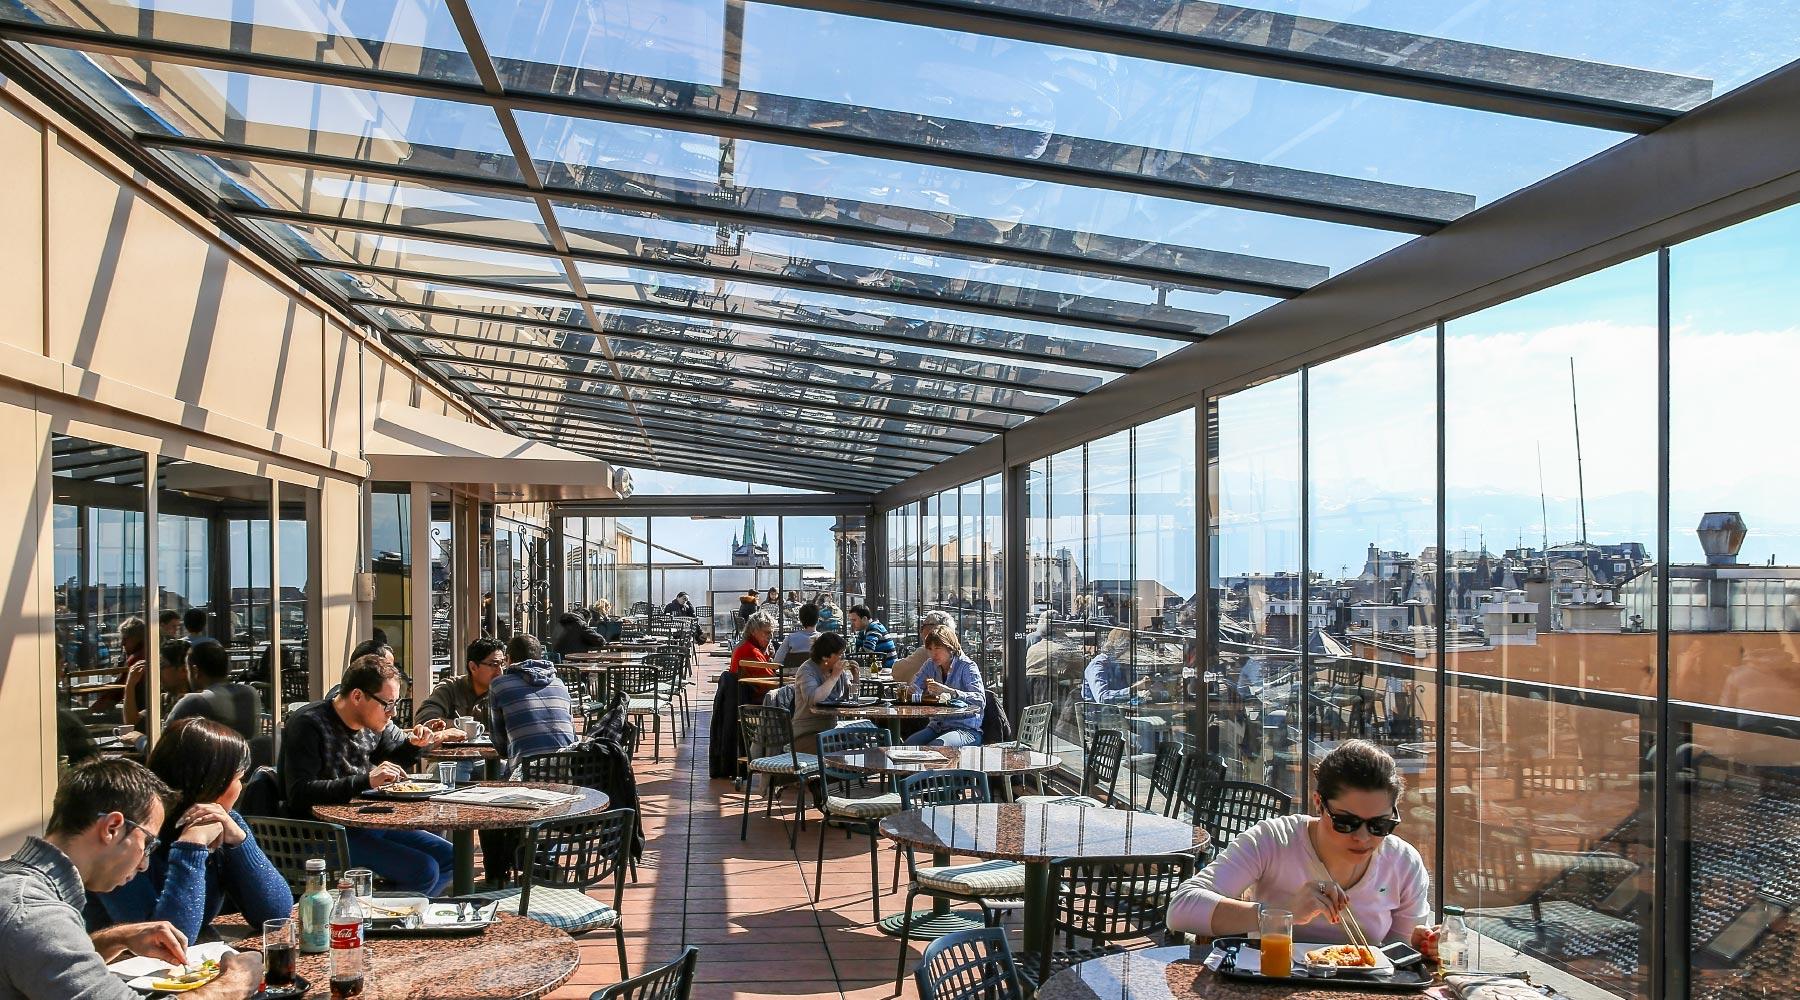 Veranda Terrasse Restaurant : V u00e9randas, Agrandissements de pi u00e8ces, Carports Karl